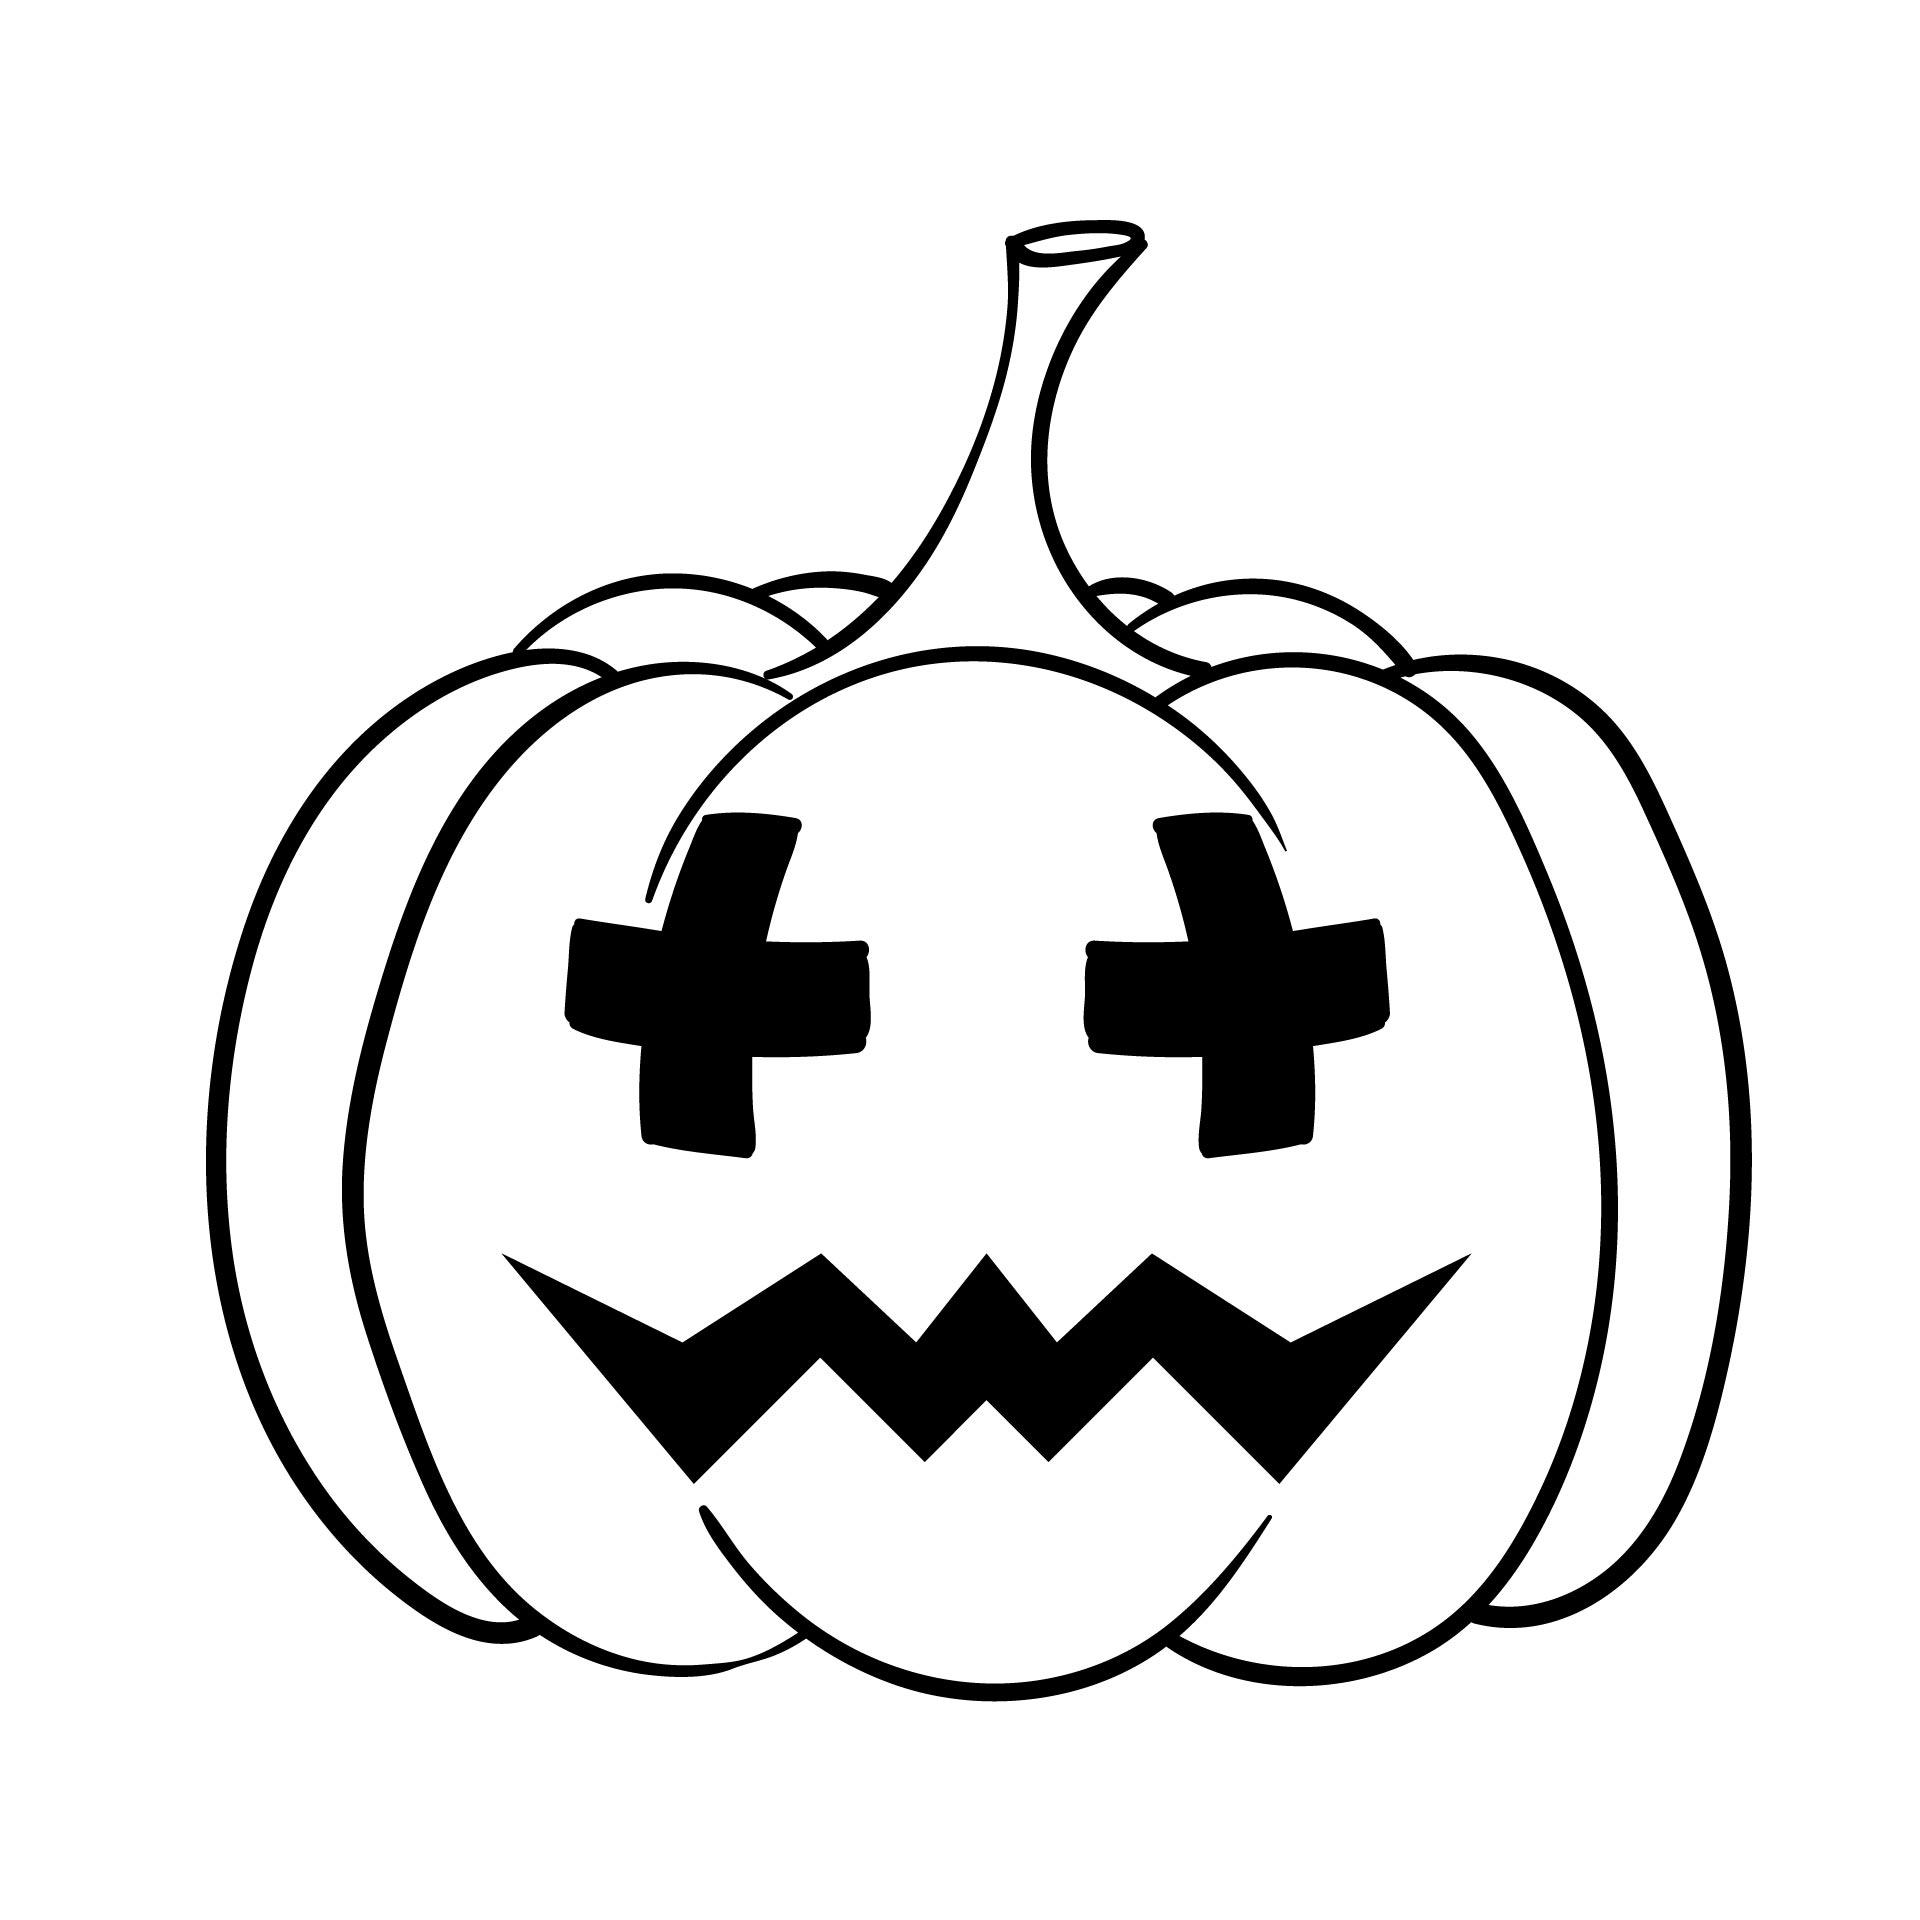 Printable Halloween Templates & Patterns